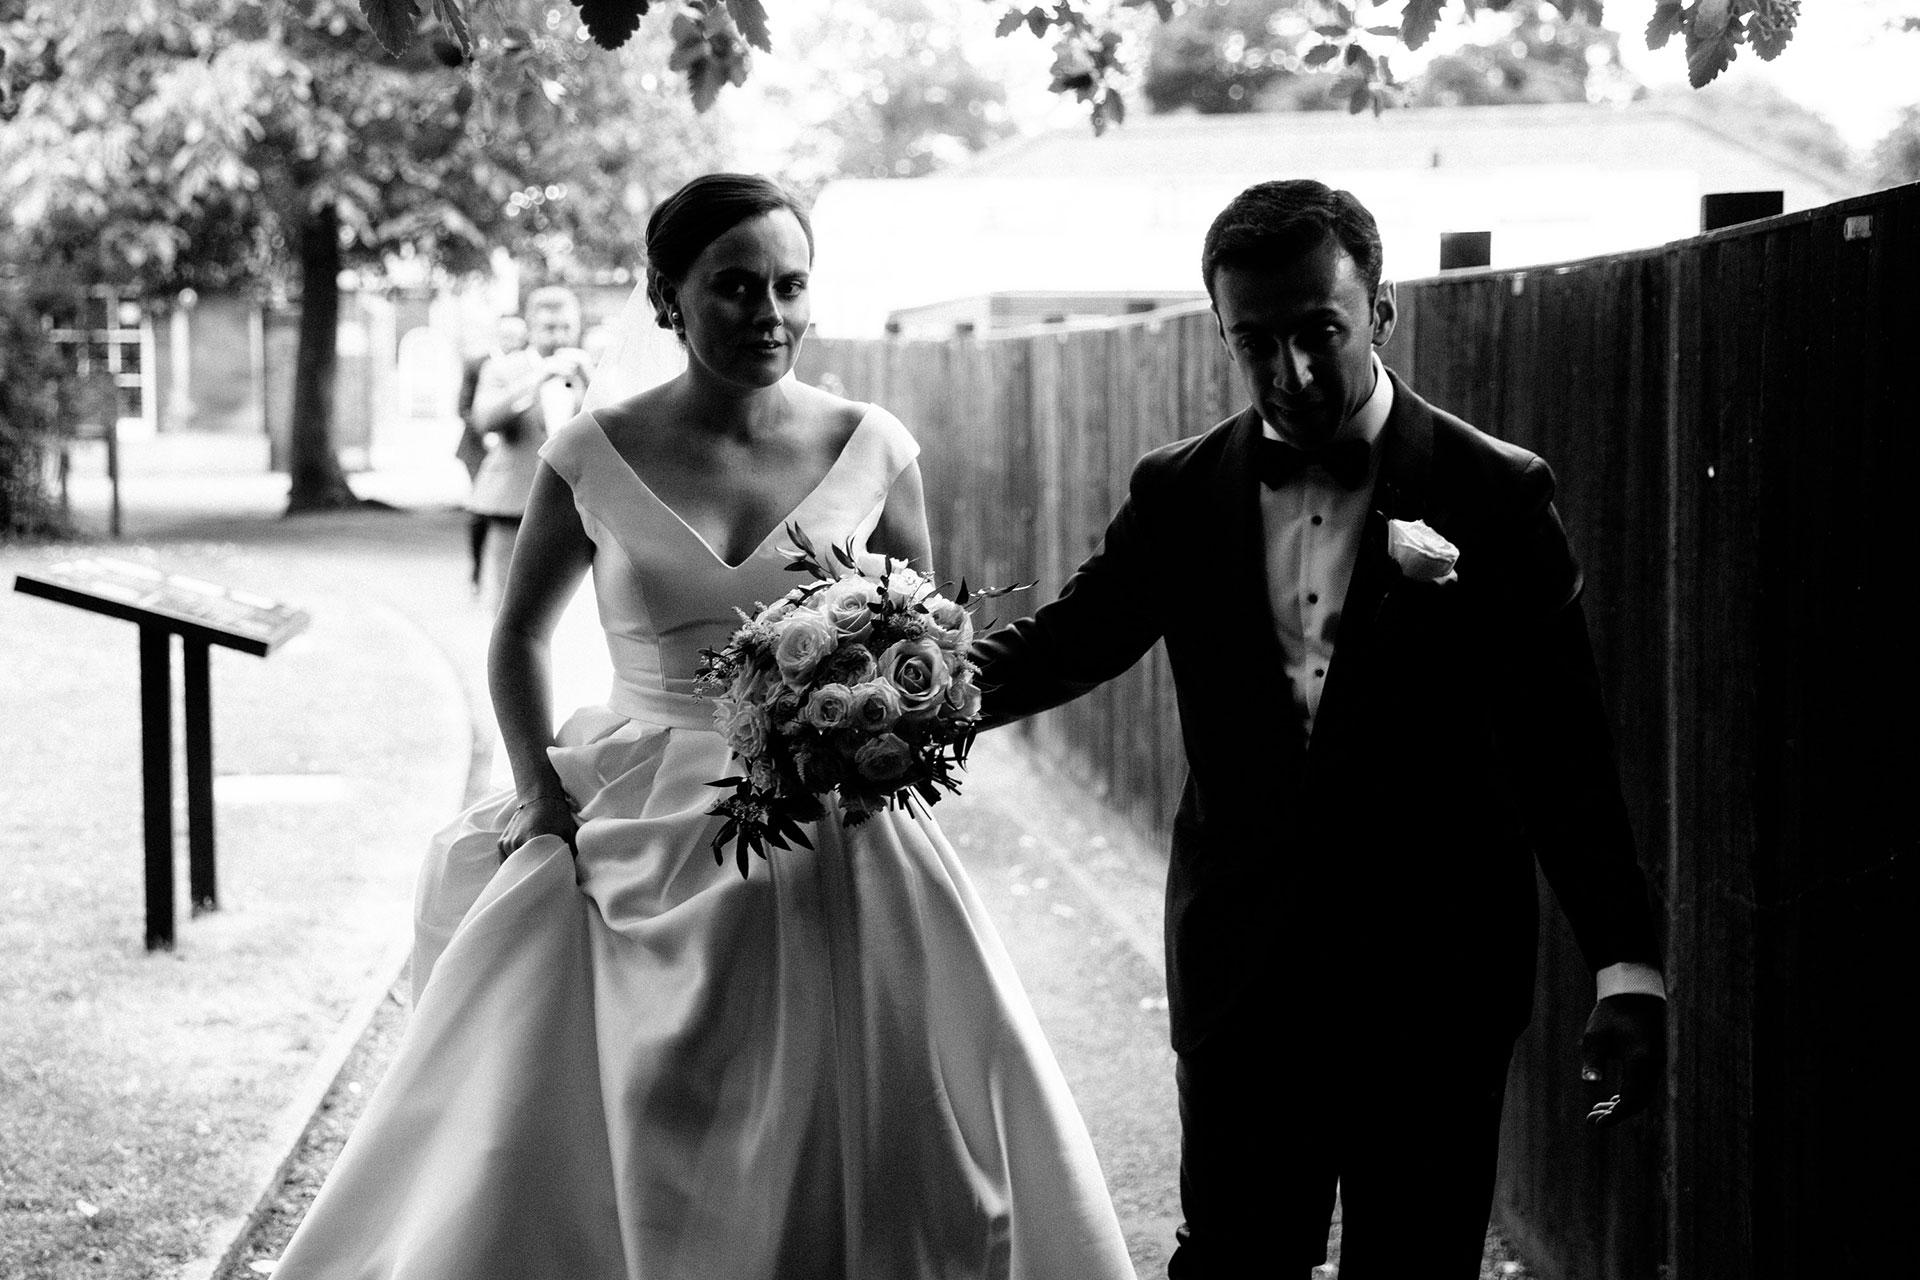 Syon-Park-Wedding-Photographer--_-Michael-Newington-Gray-232.jpg